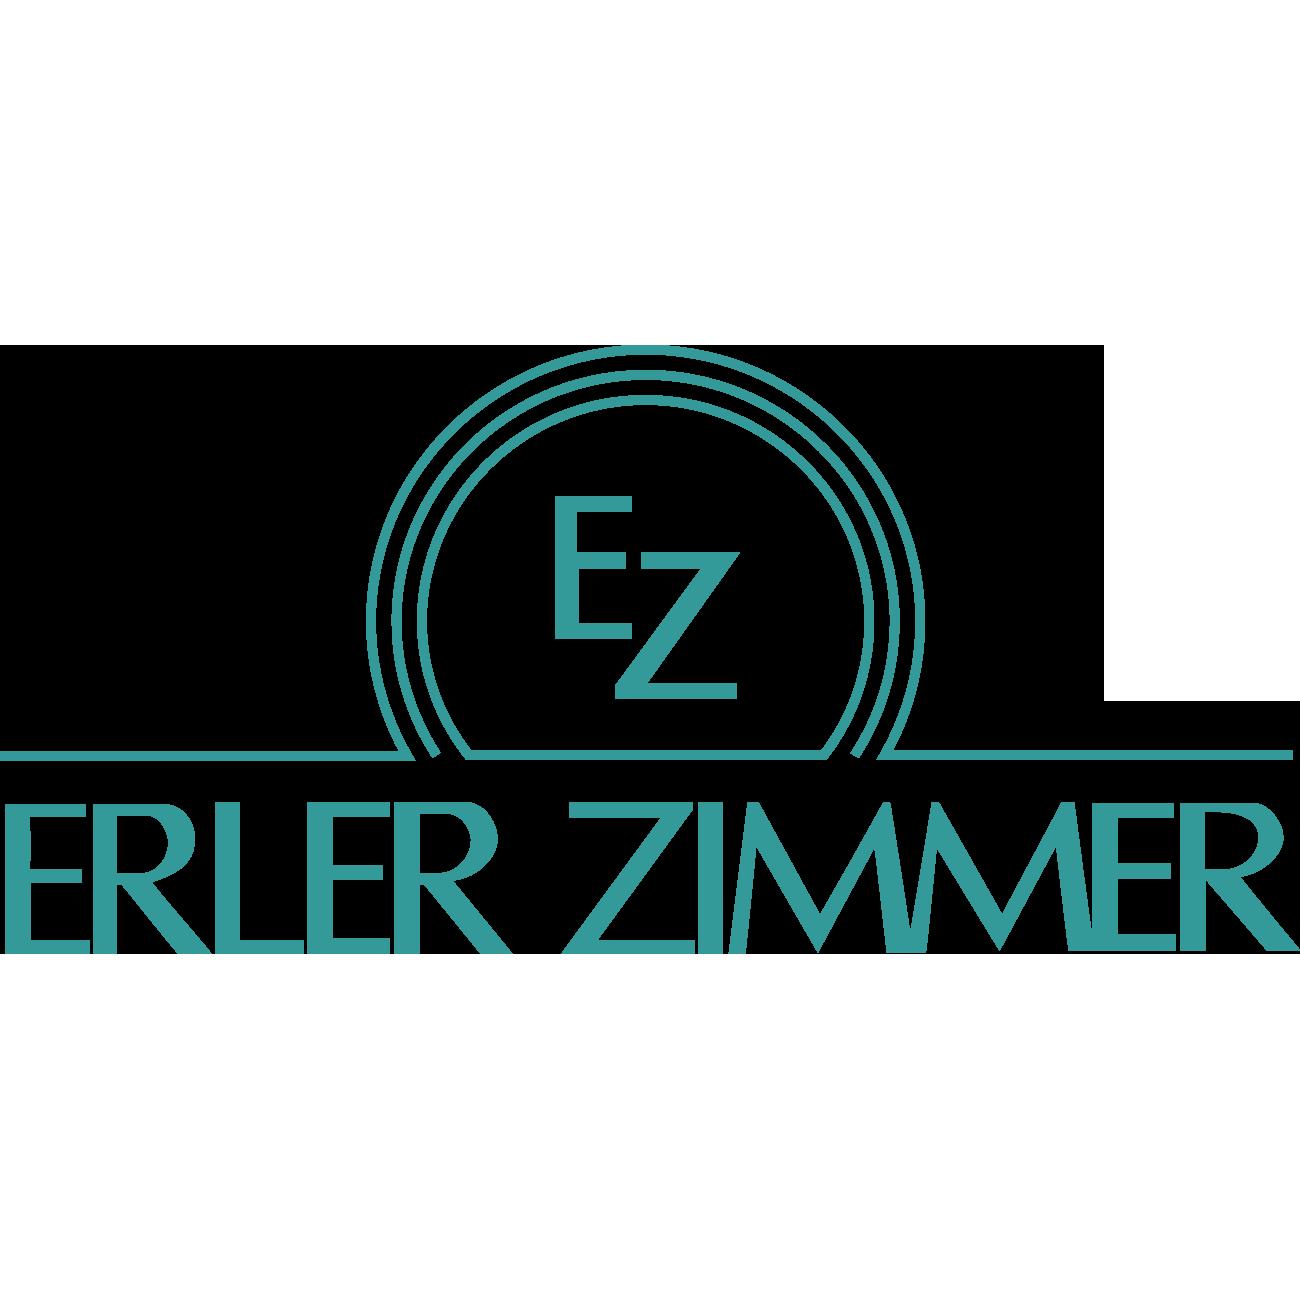 Erler-Zimmer GmbH & Co.KG